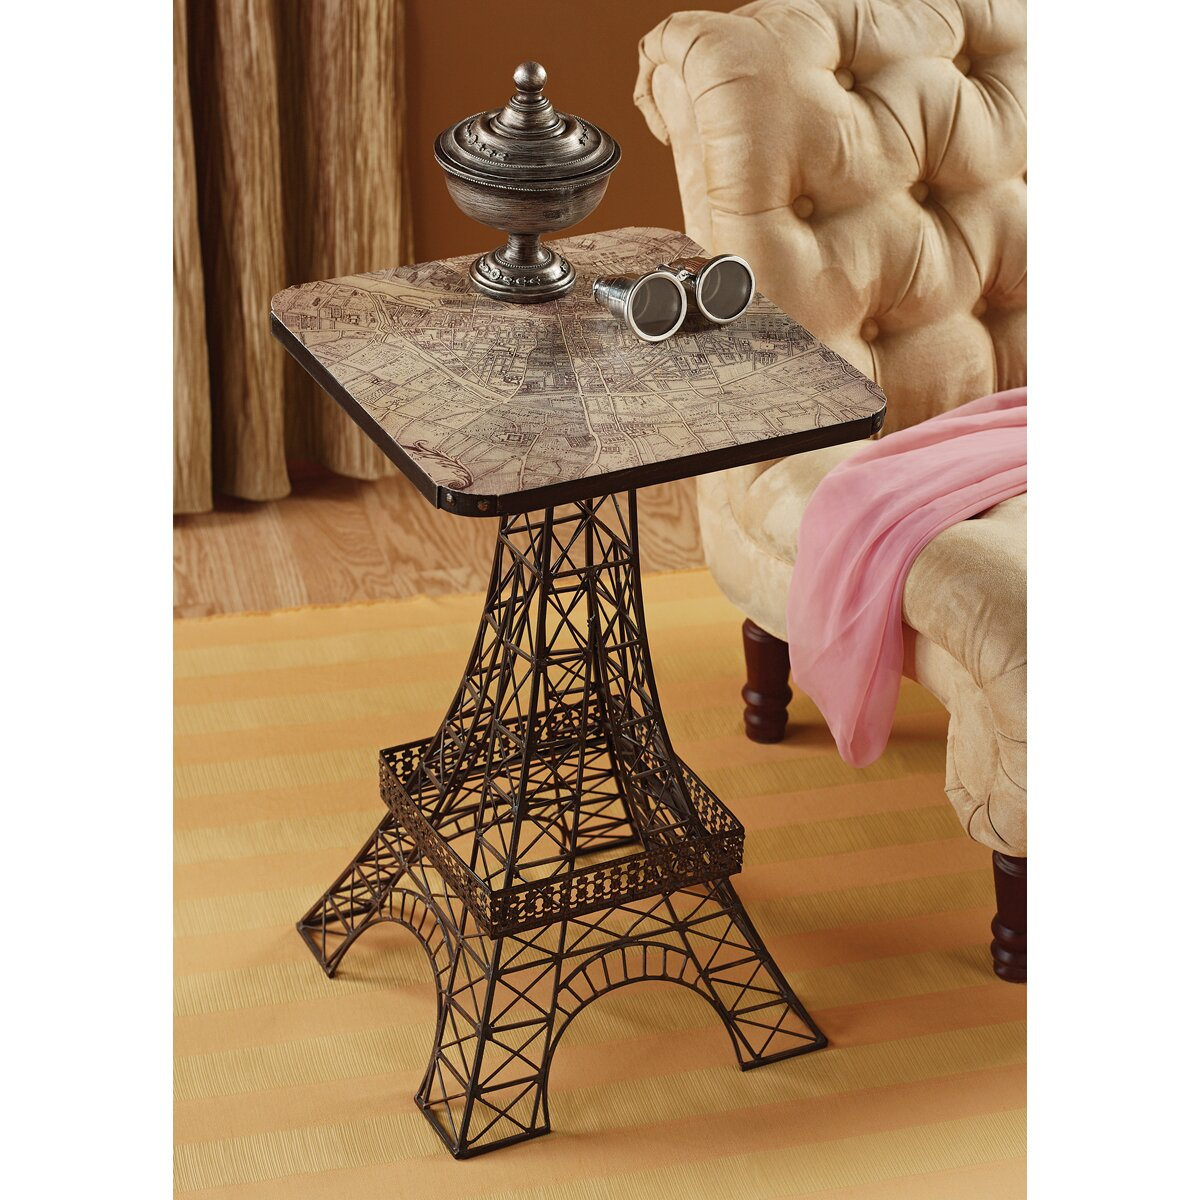 Design Toscano Tour Eiffel Sculptural Side Table amp Reviews  : Design Toscano Tour Eiffel Sculptural Side Table MH20656 from www.wayfair.com size 1200 x 1200 jpeg 383kB